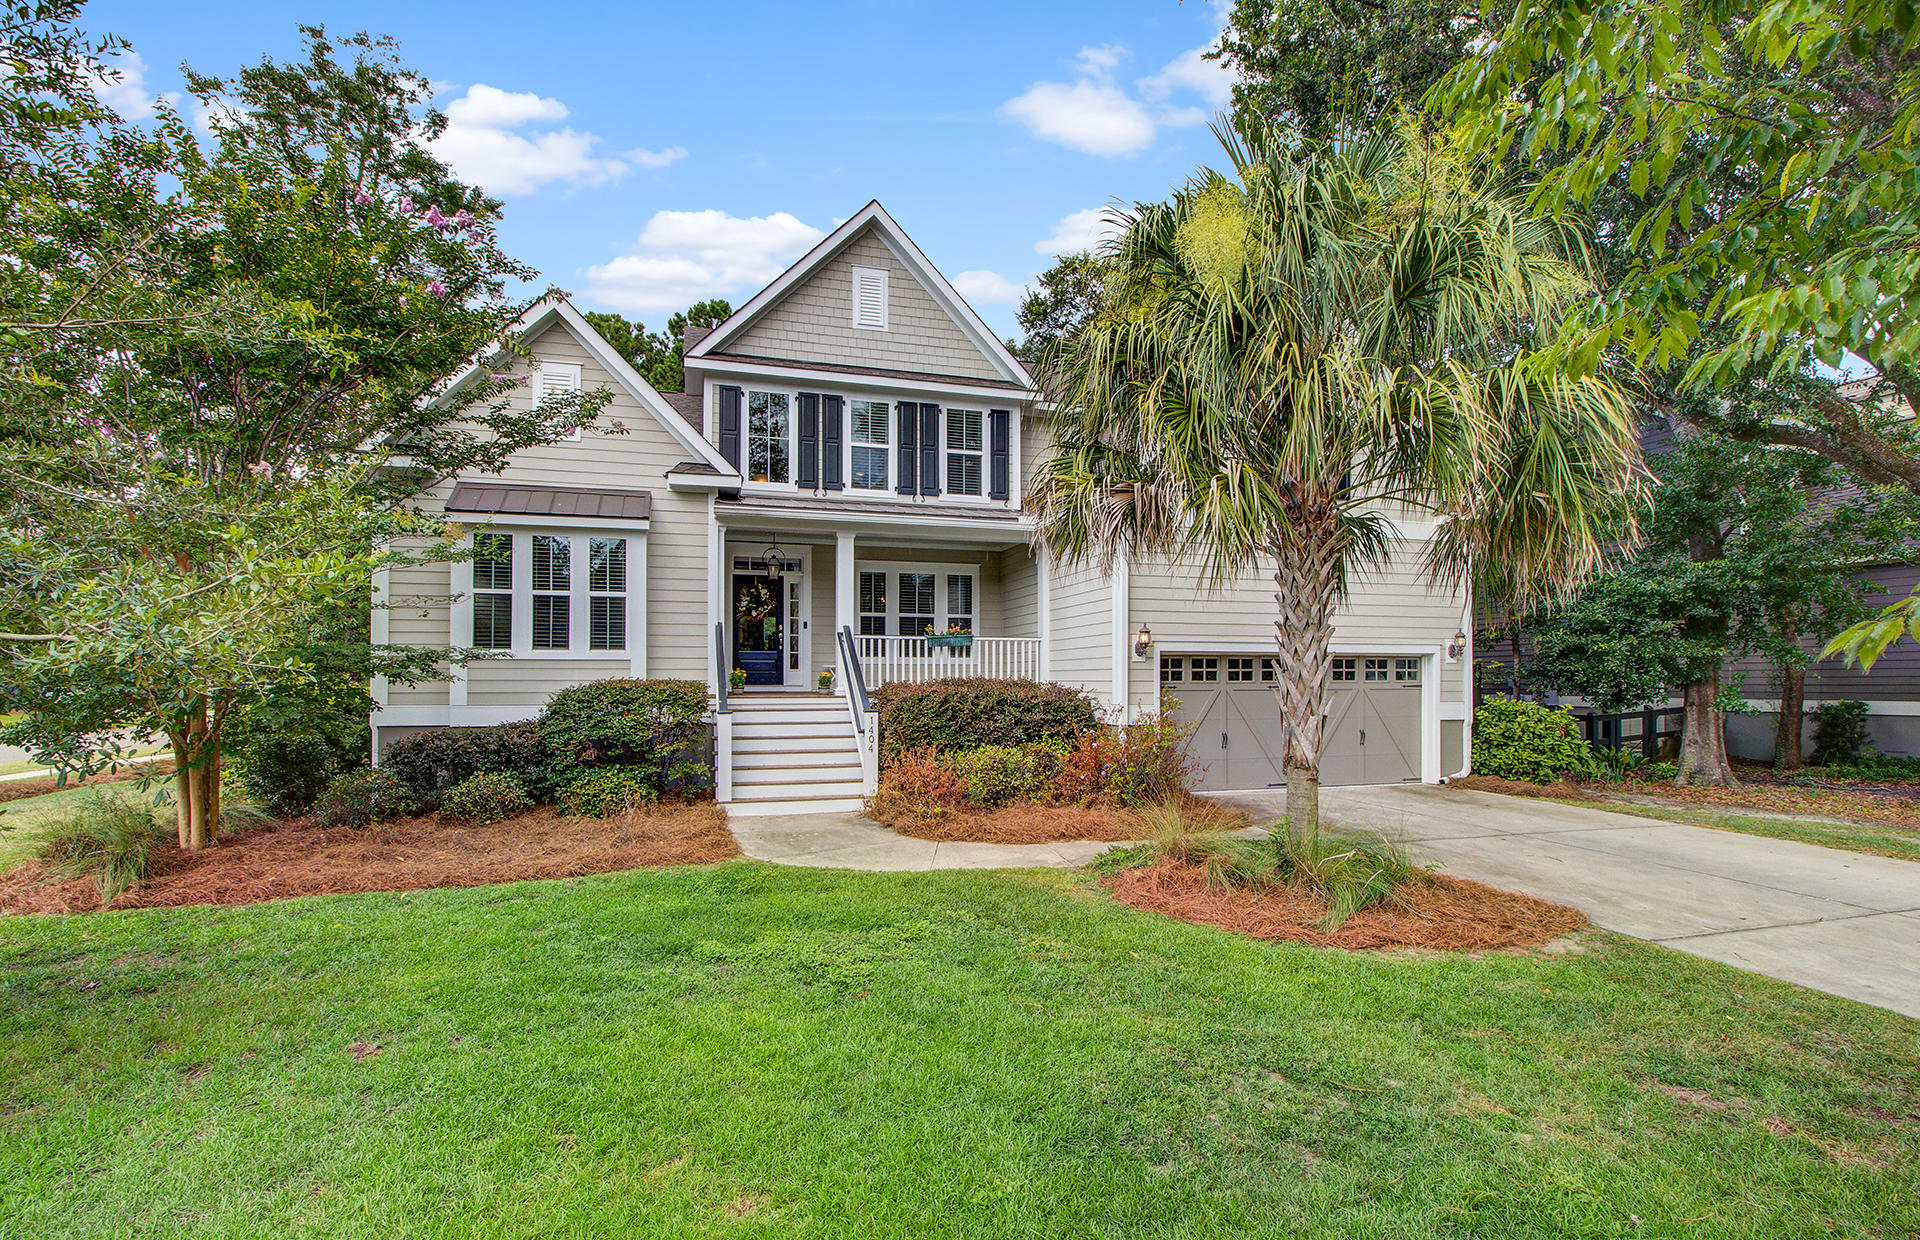 Scotts Creek Homes For Sale - 1404 Scotts Creek, Mount Pleasant, SC - 48